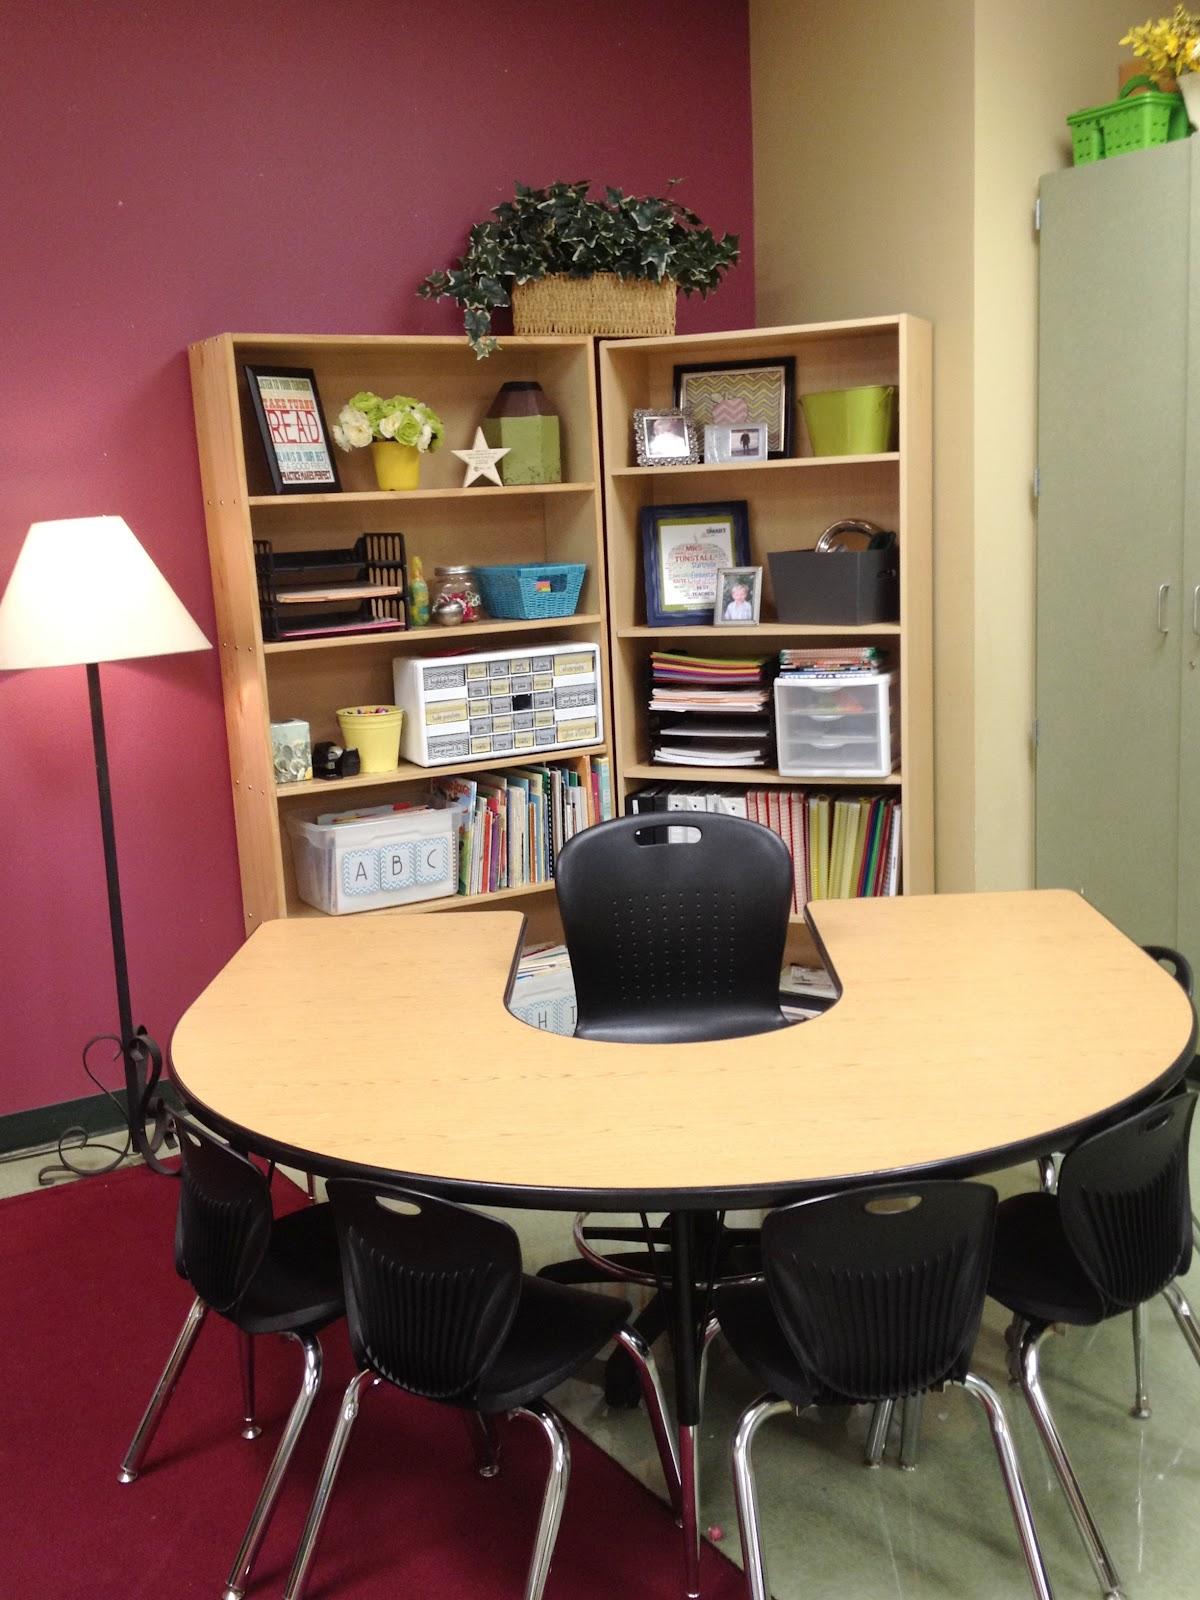 Tunstall S Teaching Tidbits Classroom Tour 2012 2013